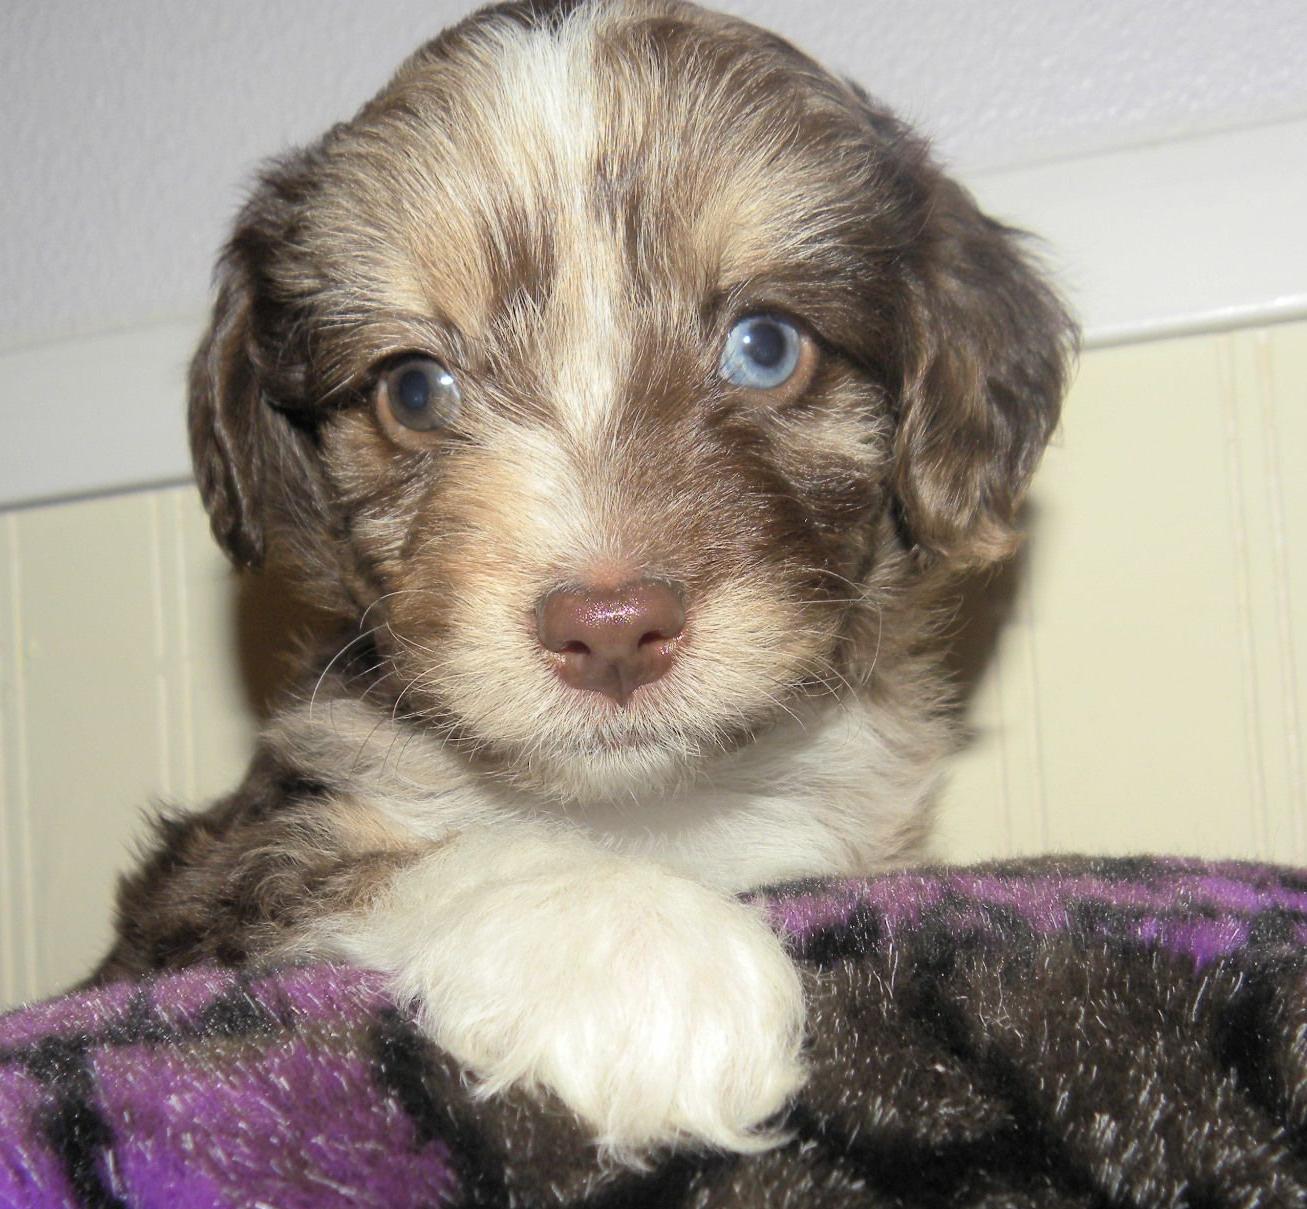 Blitzen Japanese Chin Puppy For Sale Near Salem Oregon Ed375541 29c1 Japanese Chin Japanese Chin Puppies Cute Puppies